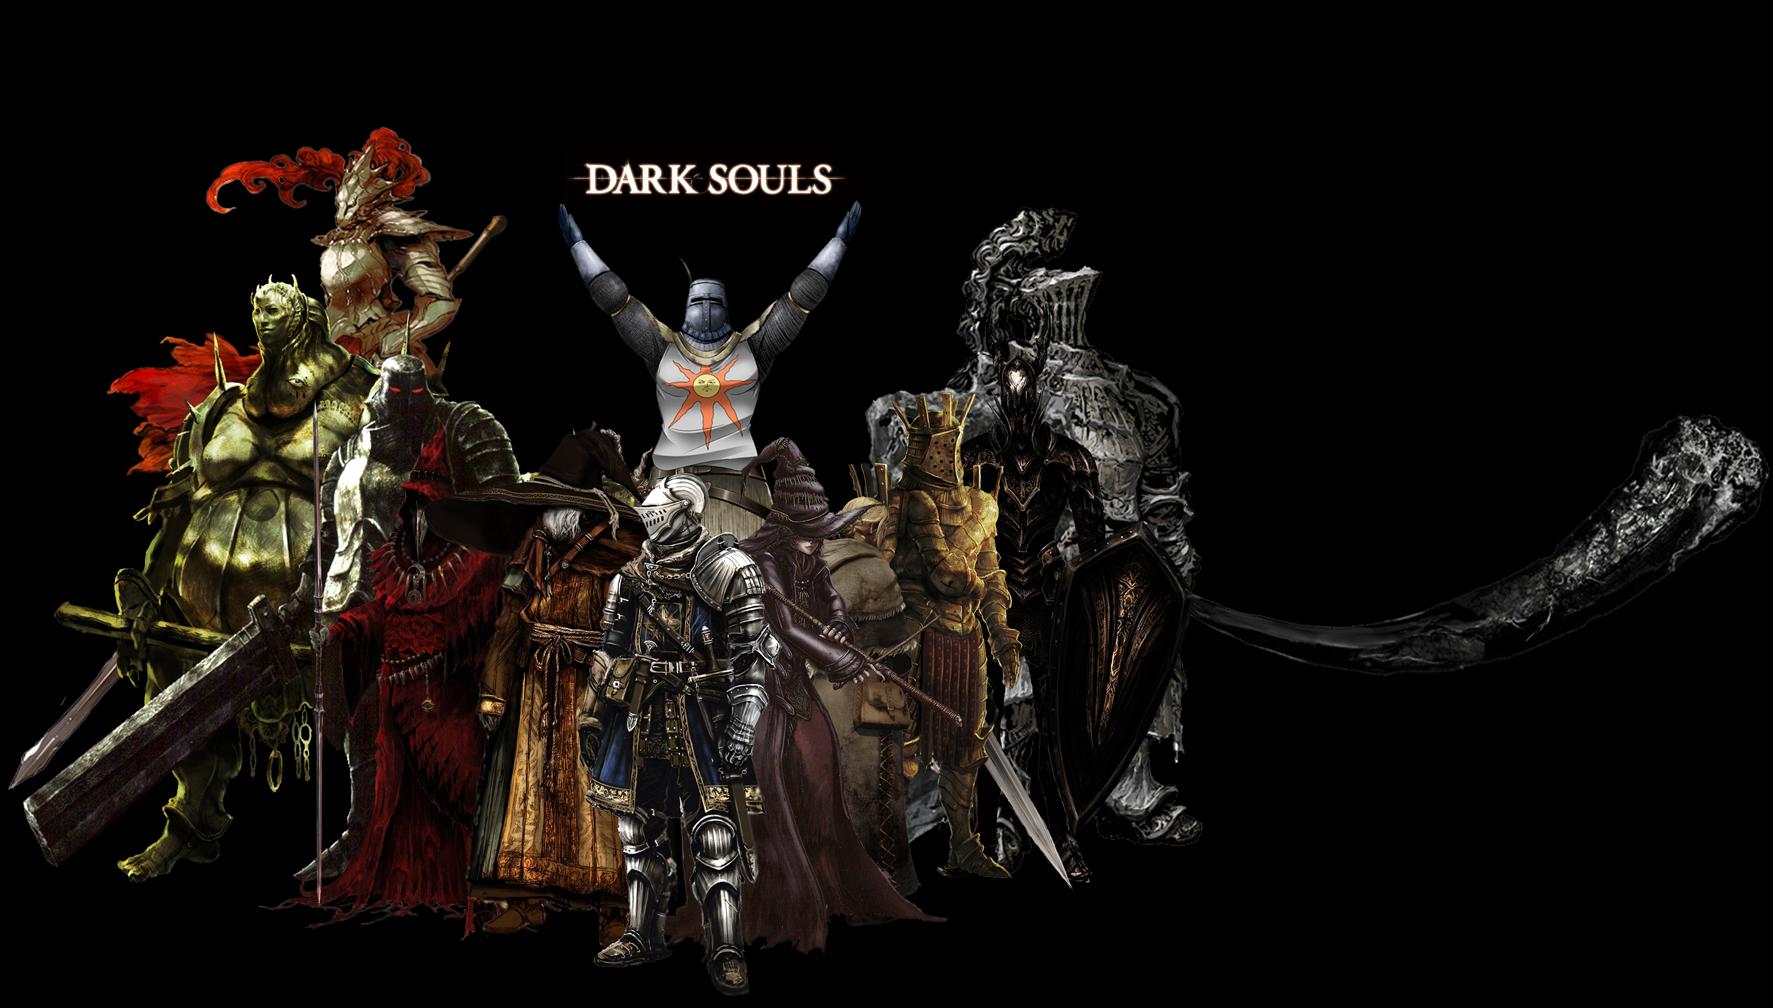 dark_souls_a_knights_story_by_giovannimi